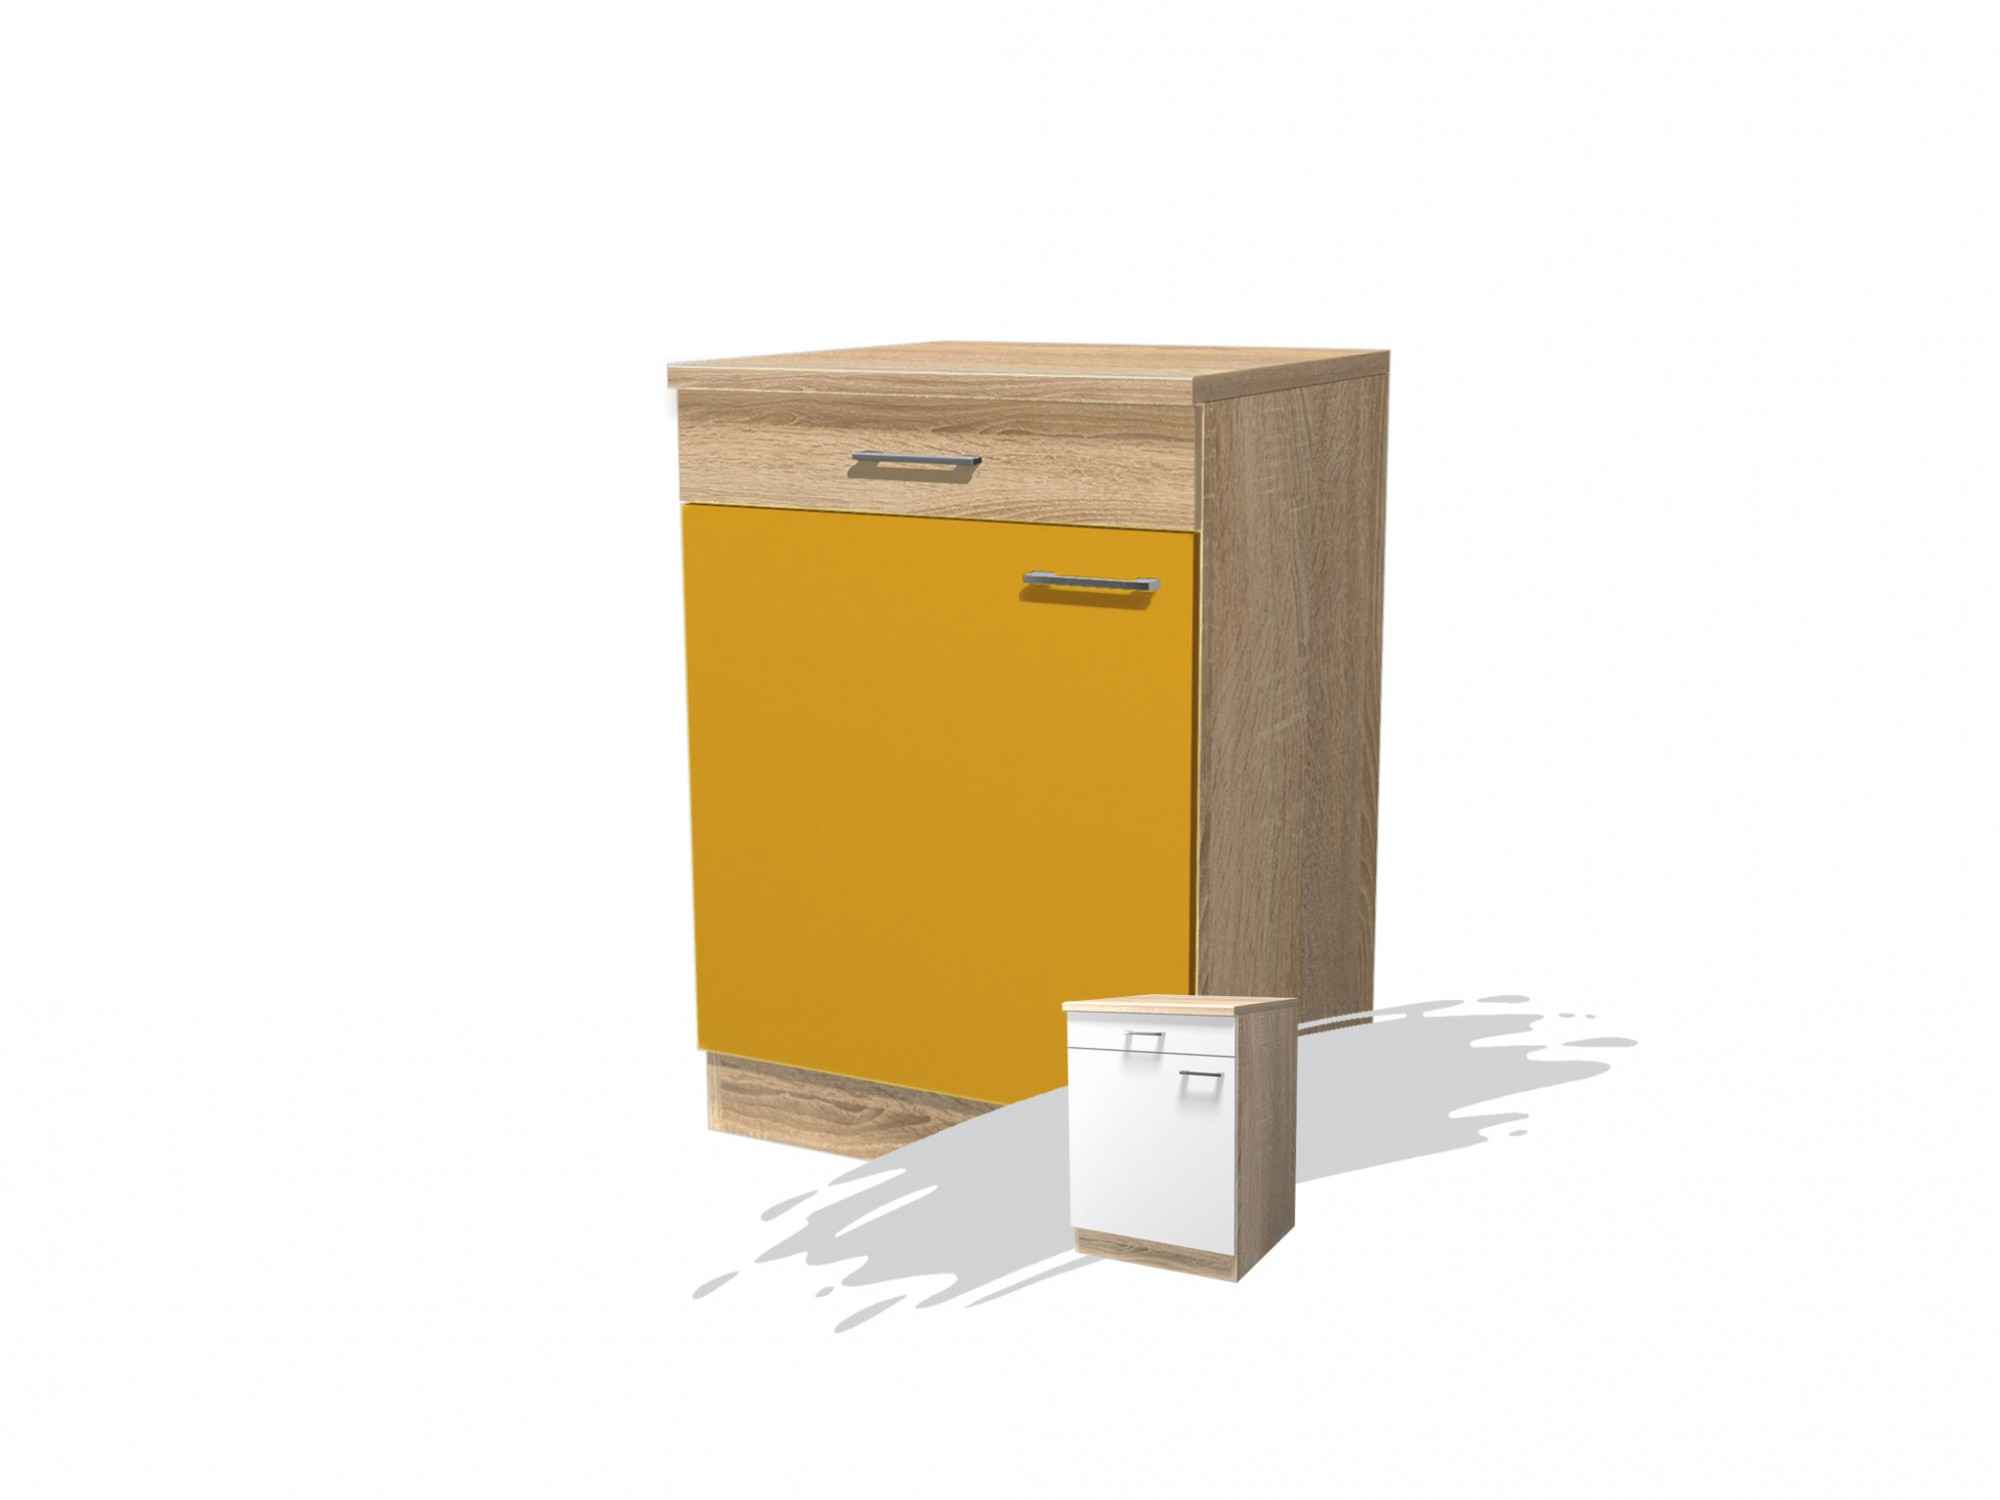 kuchenunterschrank 60cm. Black Bedroom Furniture Sets. Home Design Ideas